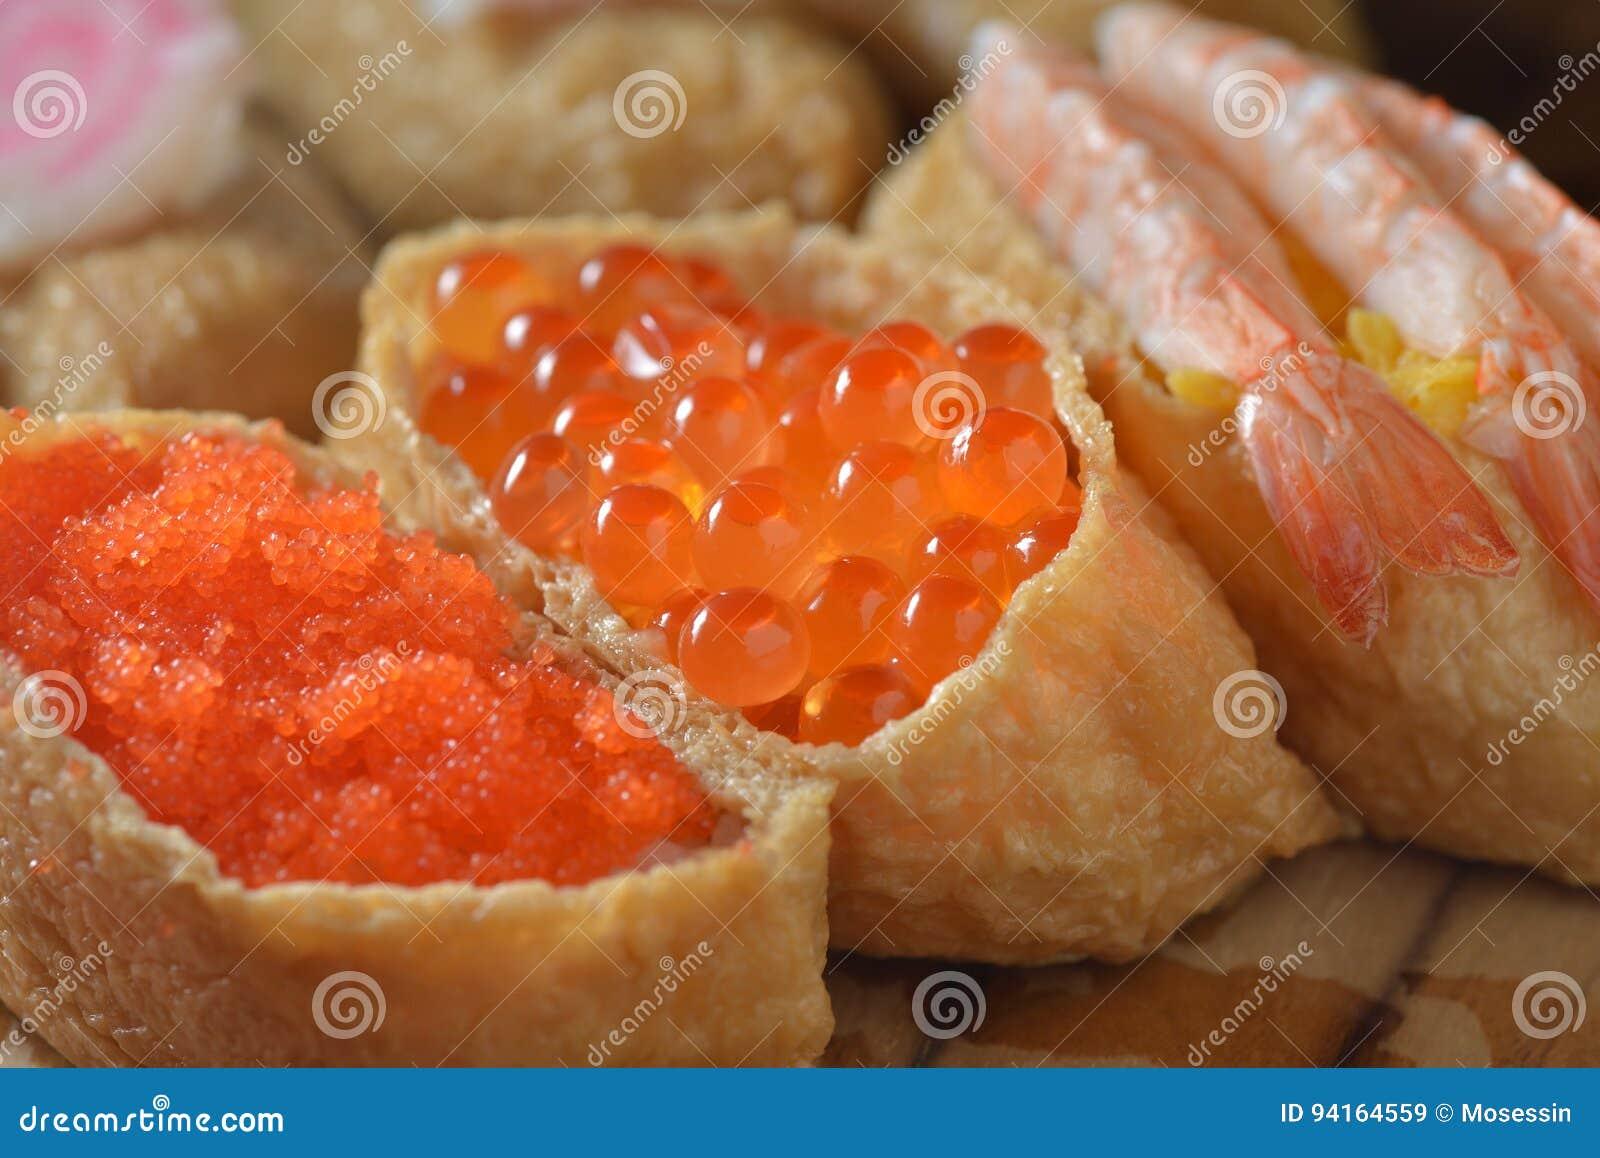 Shrimp Crab Roe Sushi Stock Image Image Of Crab Course 94164559